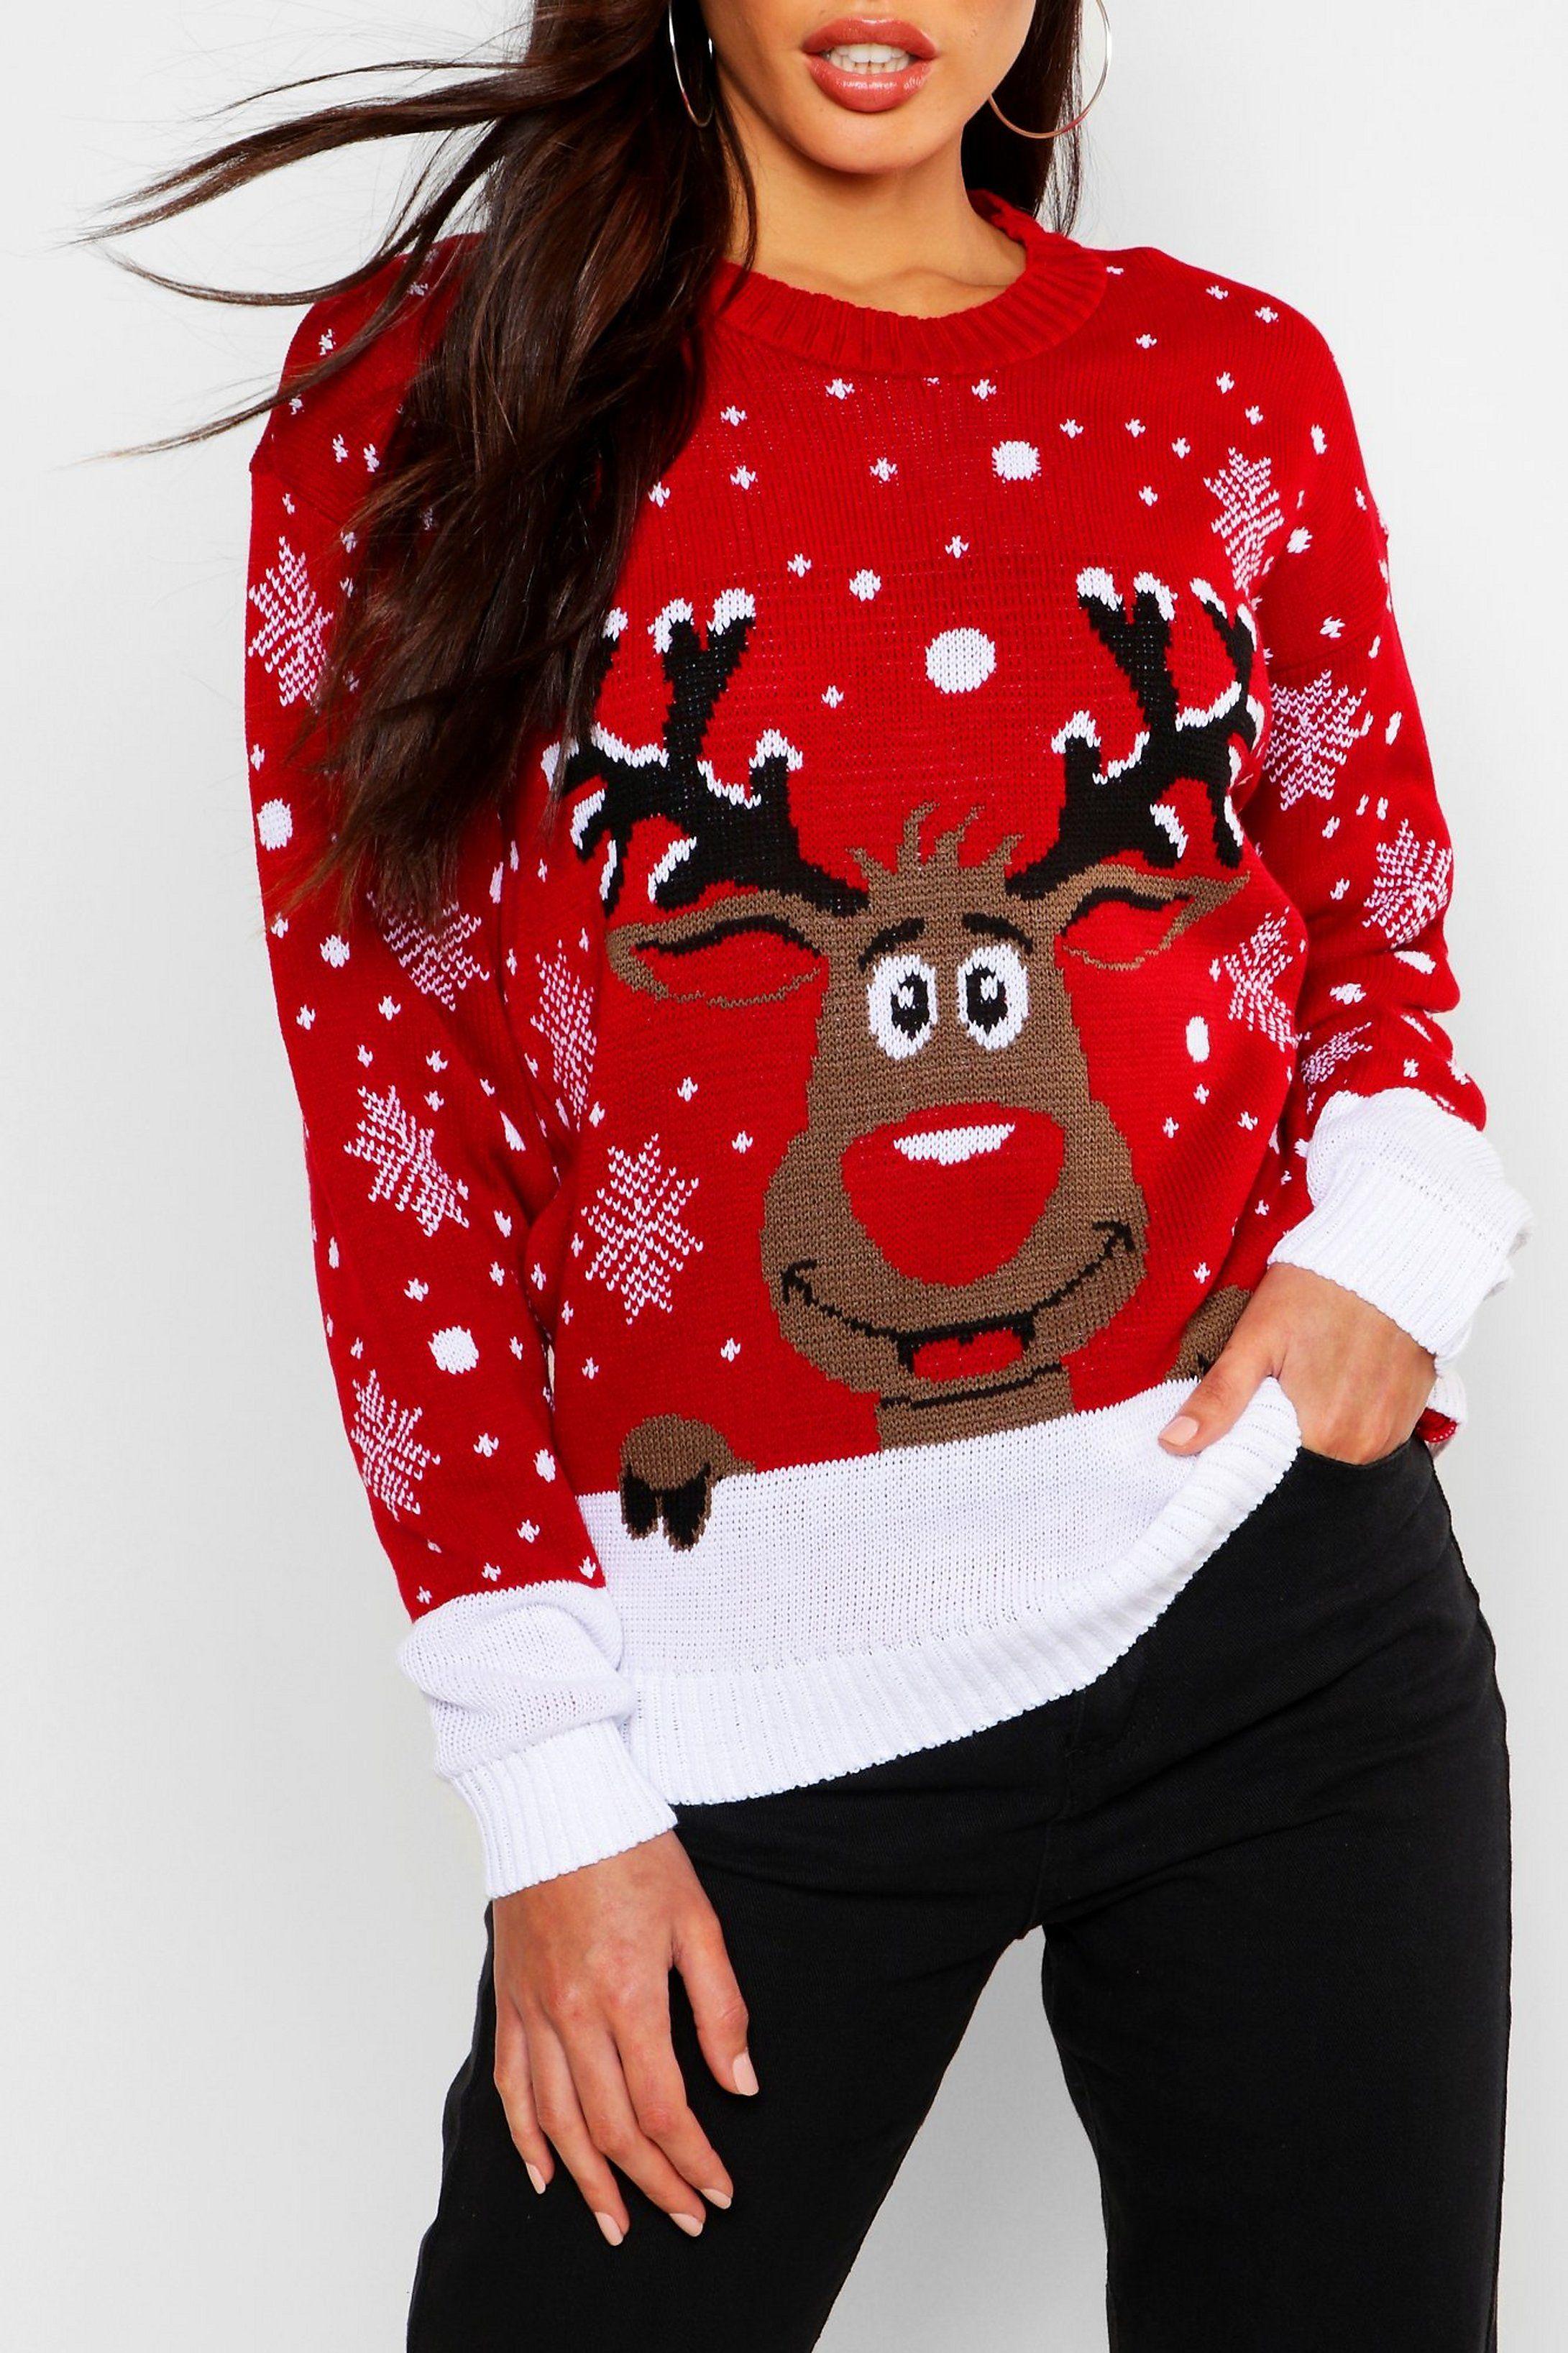 Contrast Hem Reindeer Christmas Sweater Boohoo In 2021 Reindeer Christmas Sweater Ladies Christmas Jumpers Christmas Sweaters [ 3273 x 2181 Pixel ]